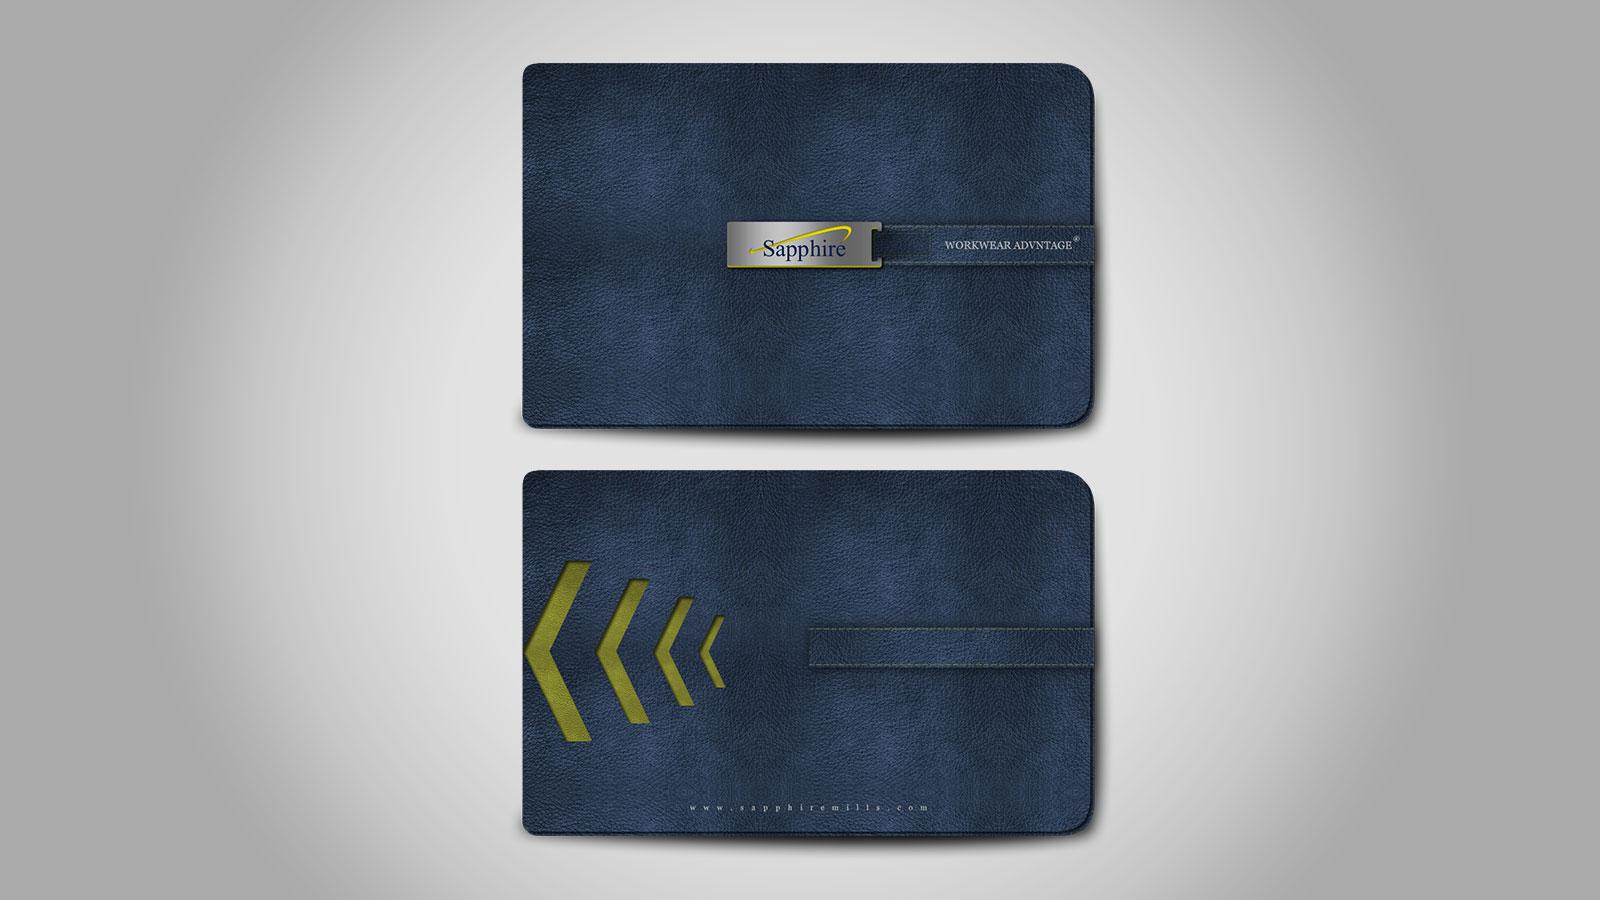 sapphire-textiles-graphic-brand-design-web-designer-hiline-lahore-pakistan-024